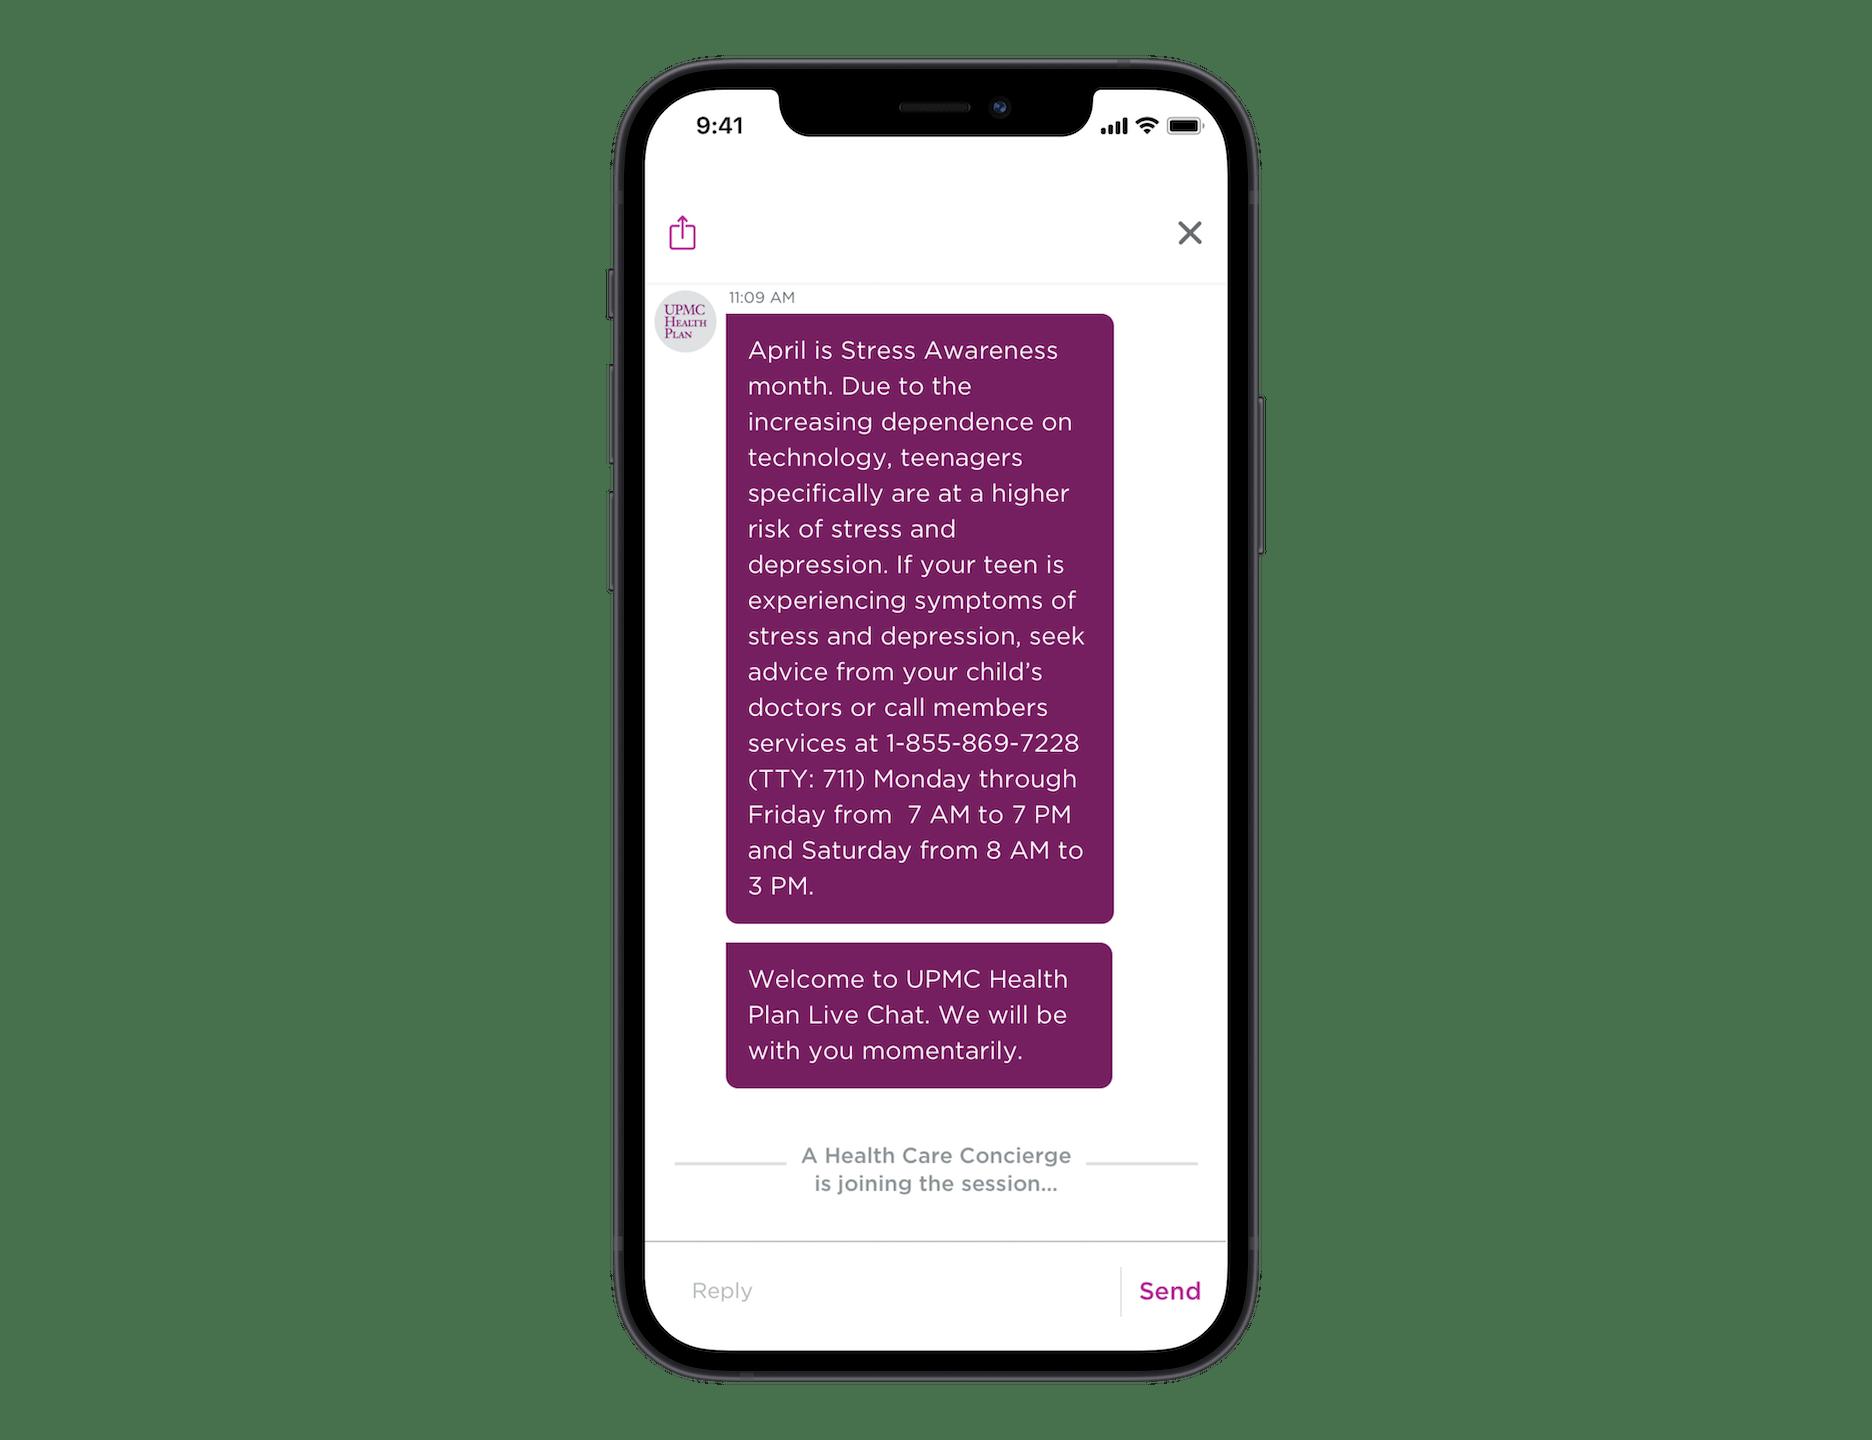 UPMC Health Plan Mobile App   UPMC Health Plan